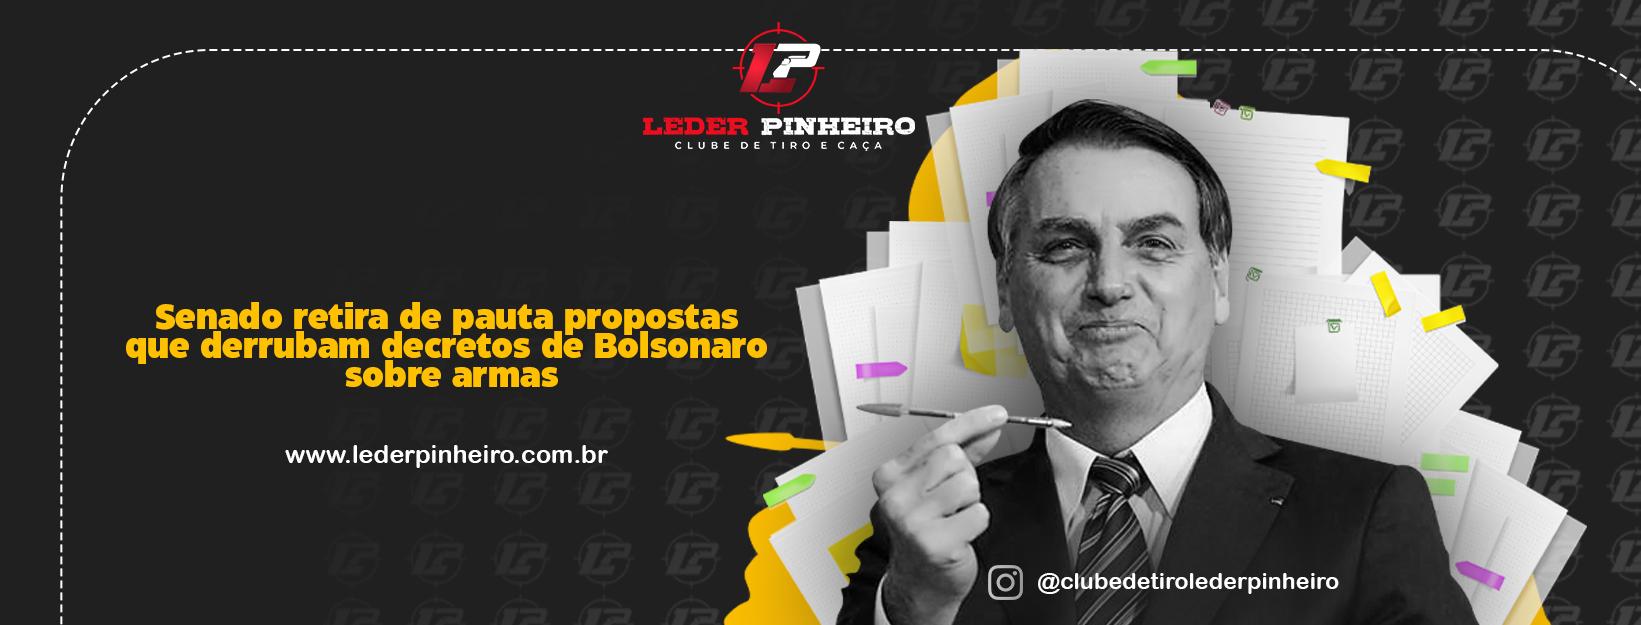 capa noticia bolsonaro senado - 9 abril 2021